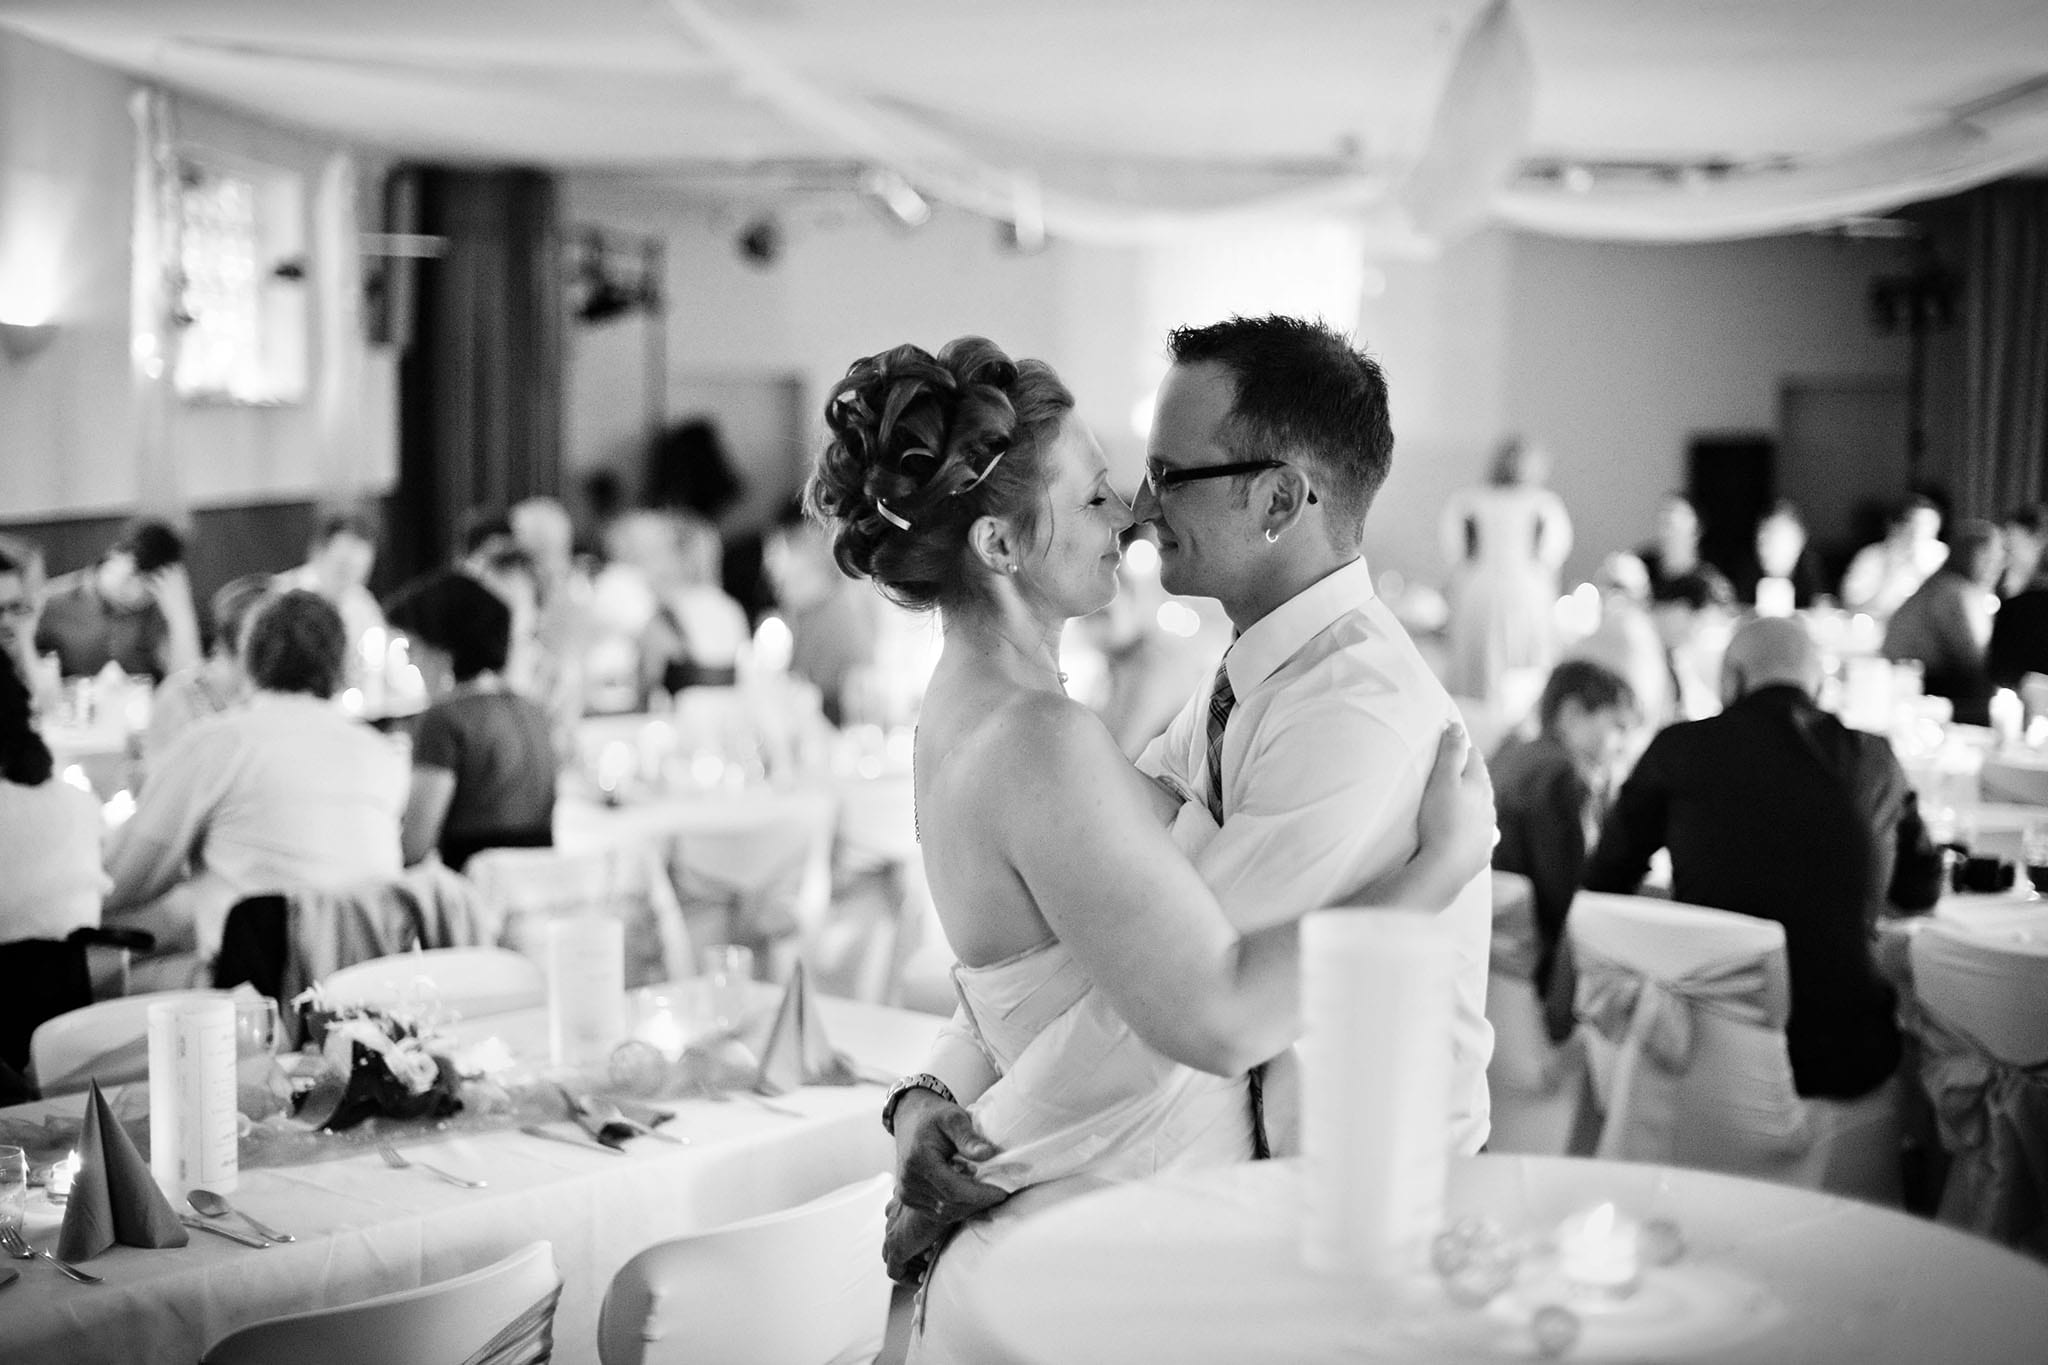 Hochzeit 061 Hochzeit Hochzeitsfeier Hochzeitsfoto Brautpaar küssen Hochzeitsfotografie Daniel Fuss Fotografie